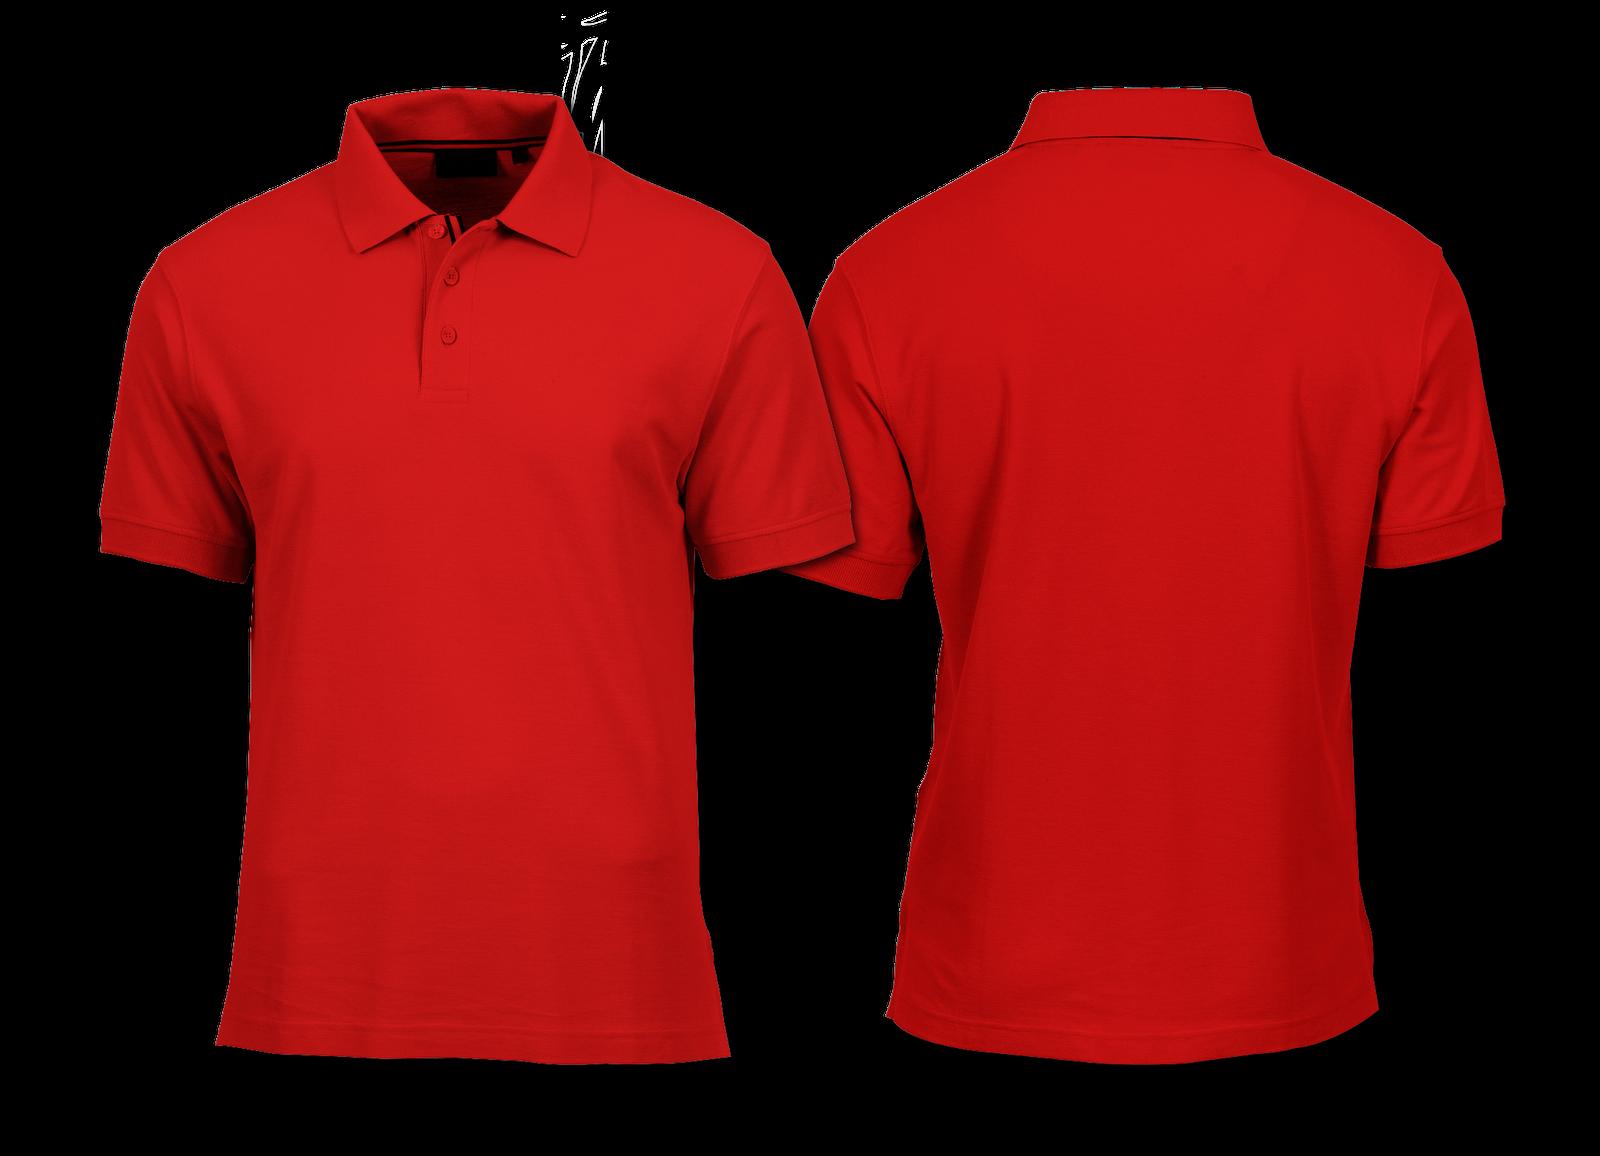 oke gan kali ini saya akan nge share mock up polo yang mau bikin polo shirt atau sekedar iseng saja download template